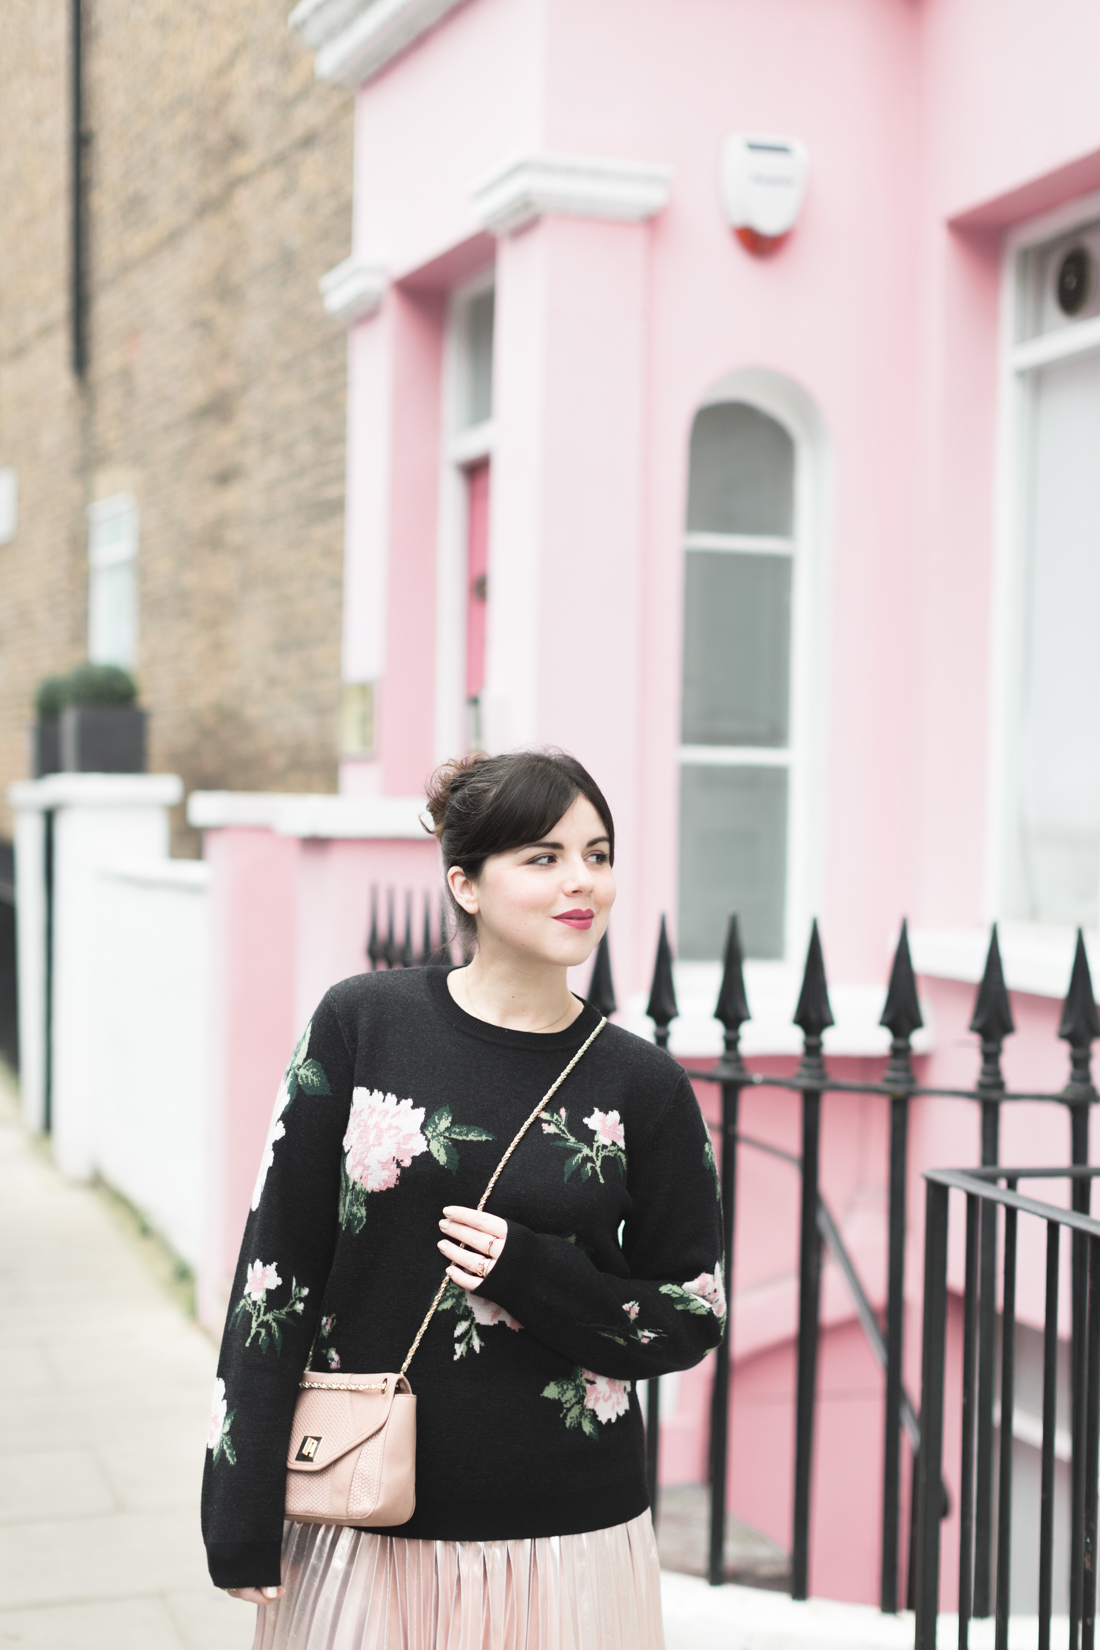 1100pinklondon copyright Pauline paulinefashionblog com 4 Pink London